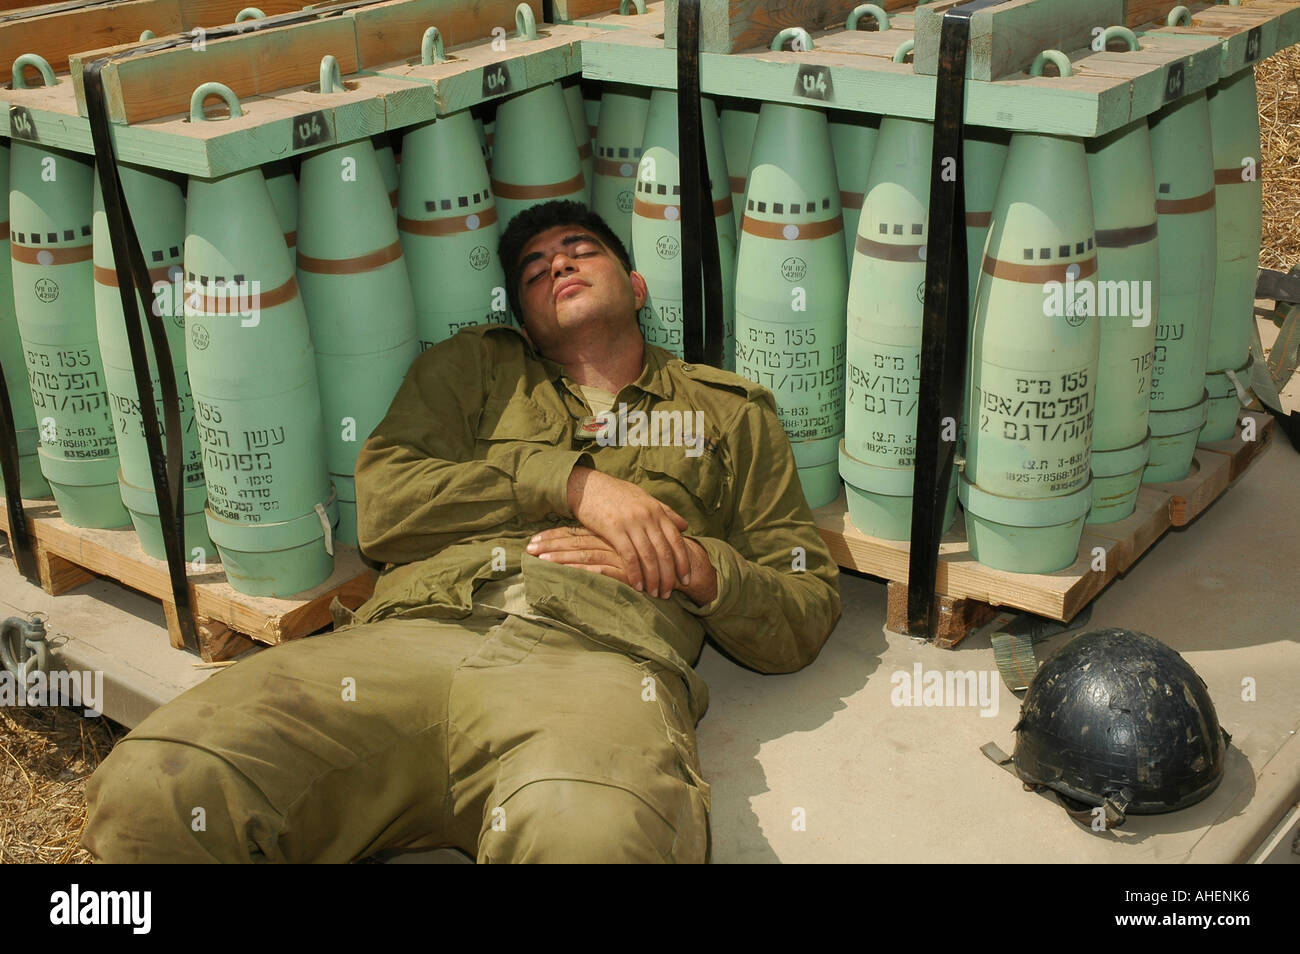 http://c8.alamy.com/comp/AHENK6/idf-israeli-soldier-sleeping-on-155mm-artillery-shells-at-the-golan-AHENK6.jpg